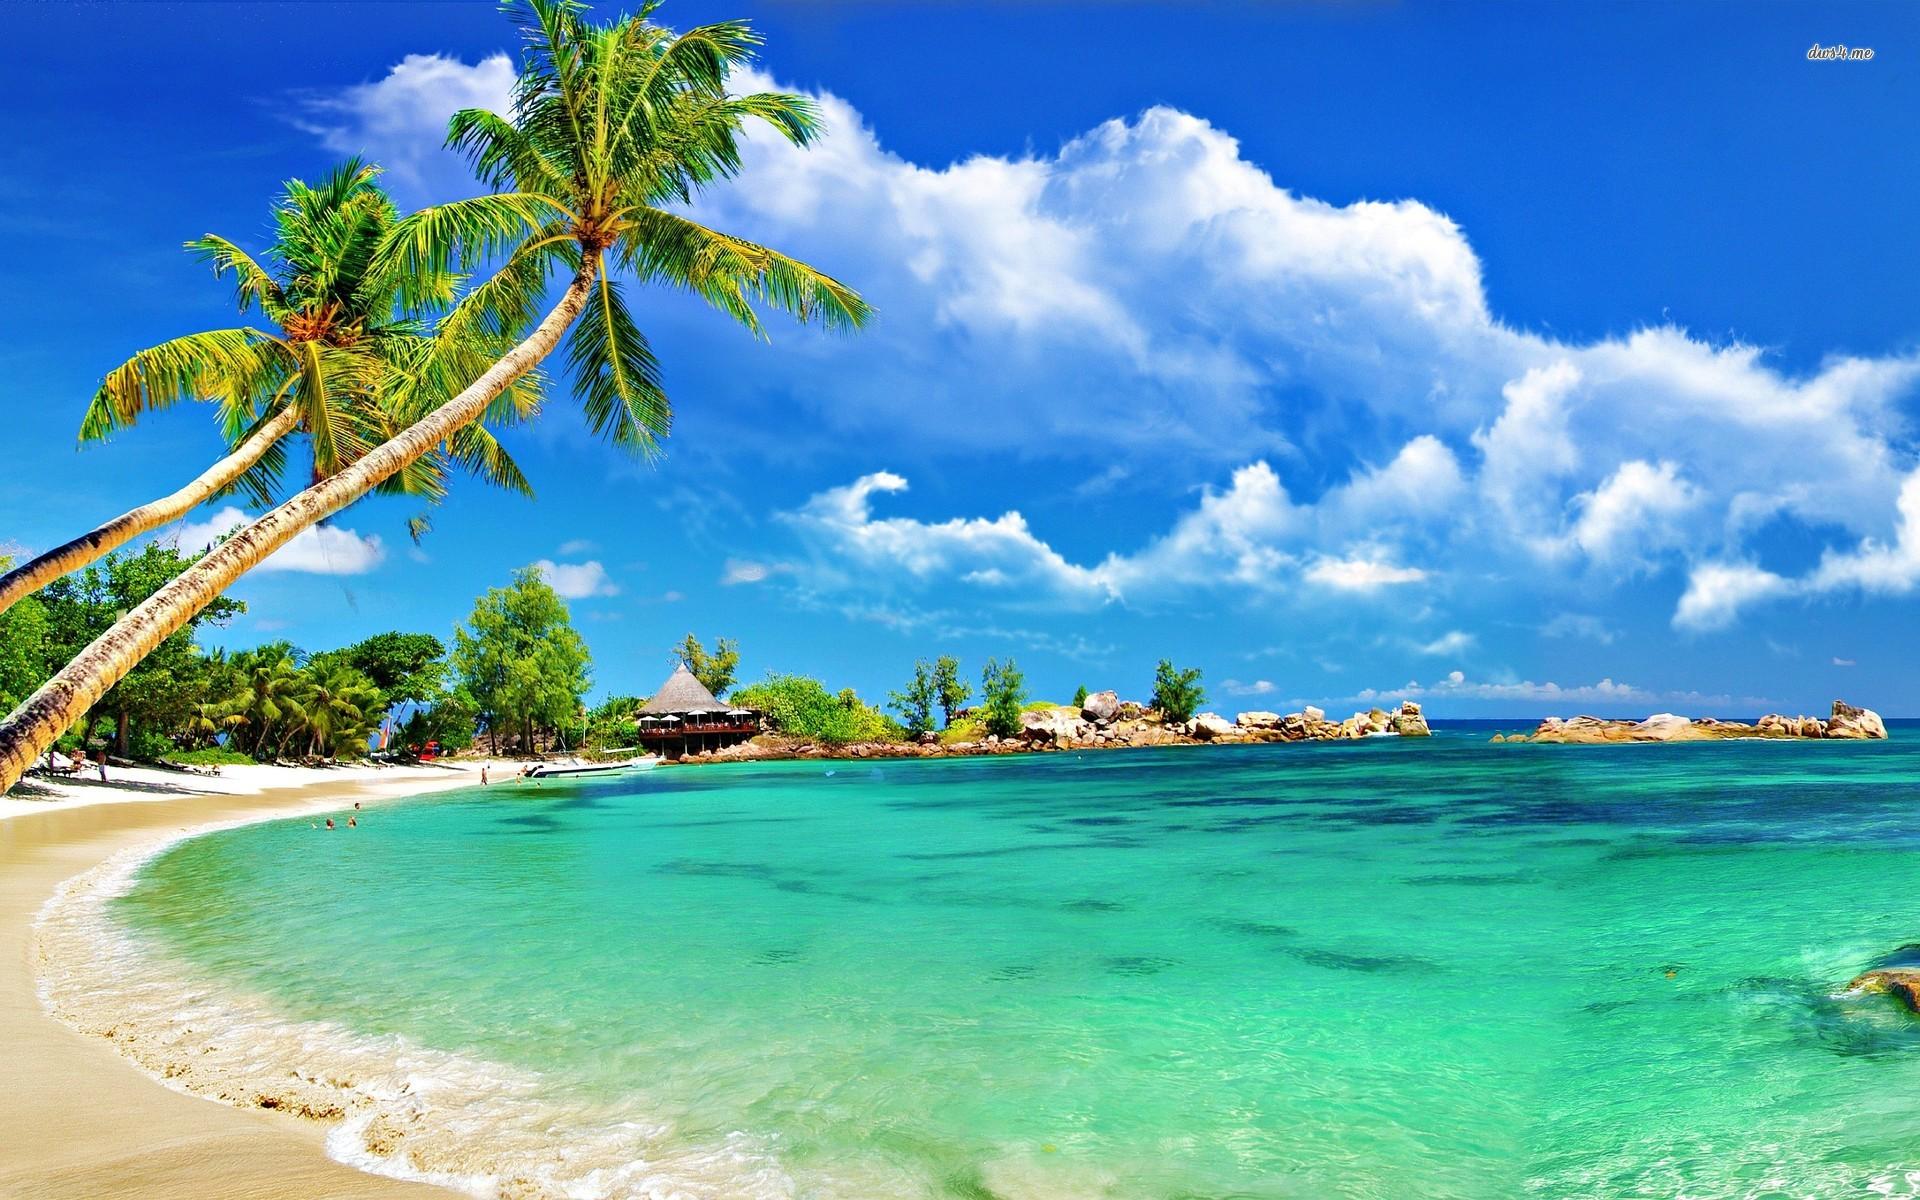 Tropical Beach wallpapers HD   446440 1920x1200